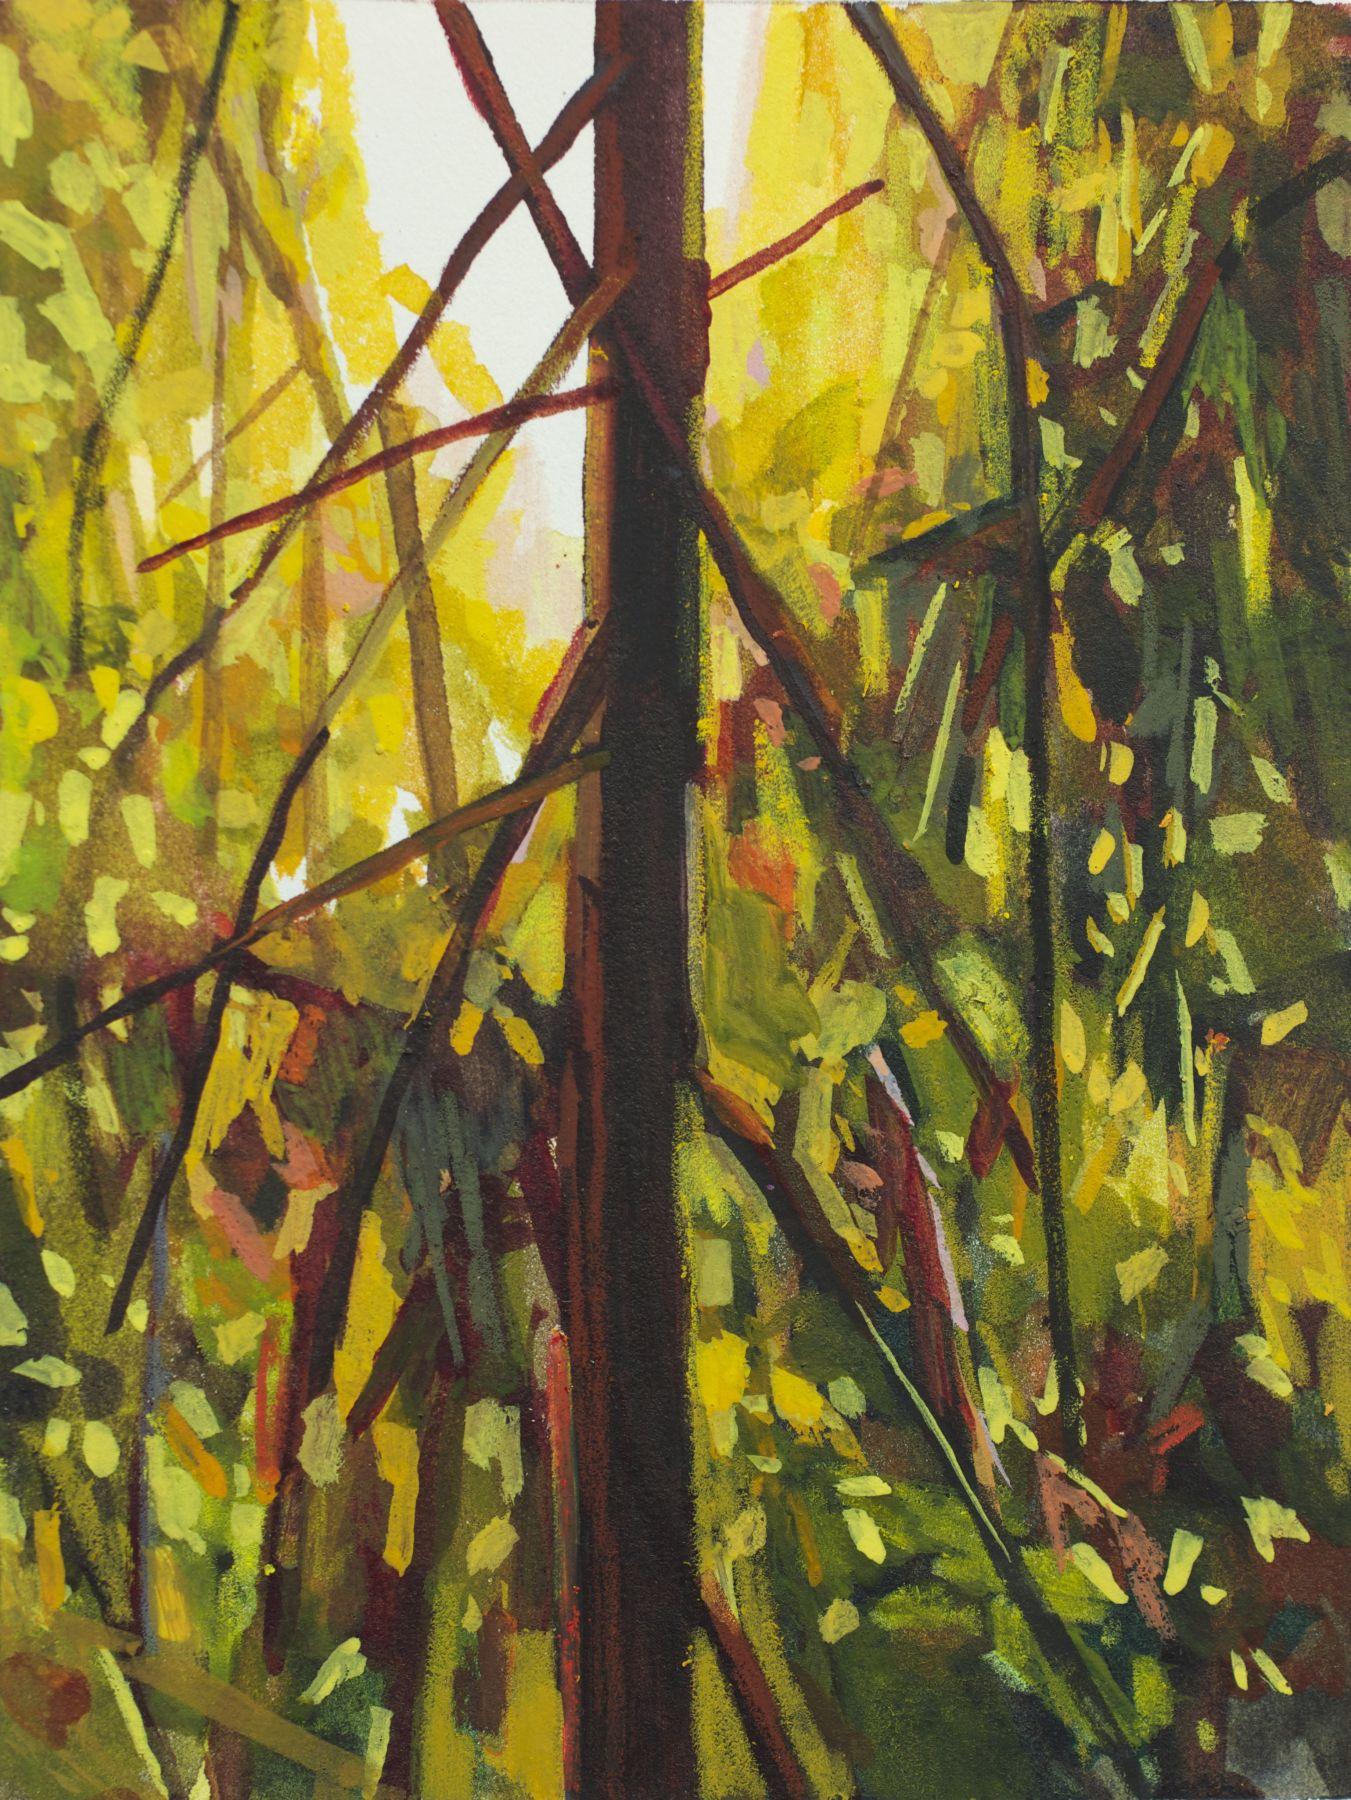 Tree, 2015, mixed media on paper